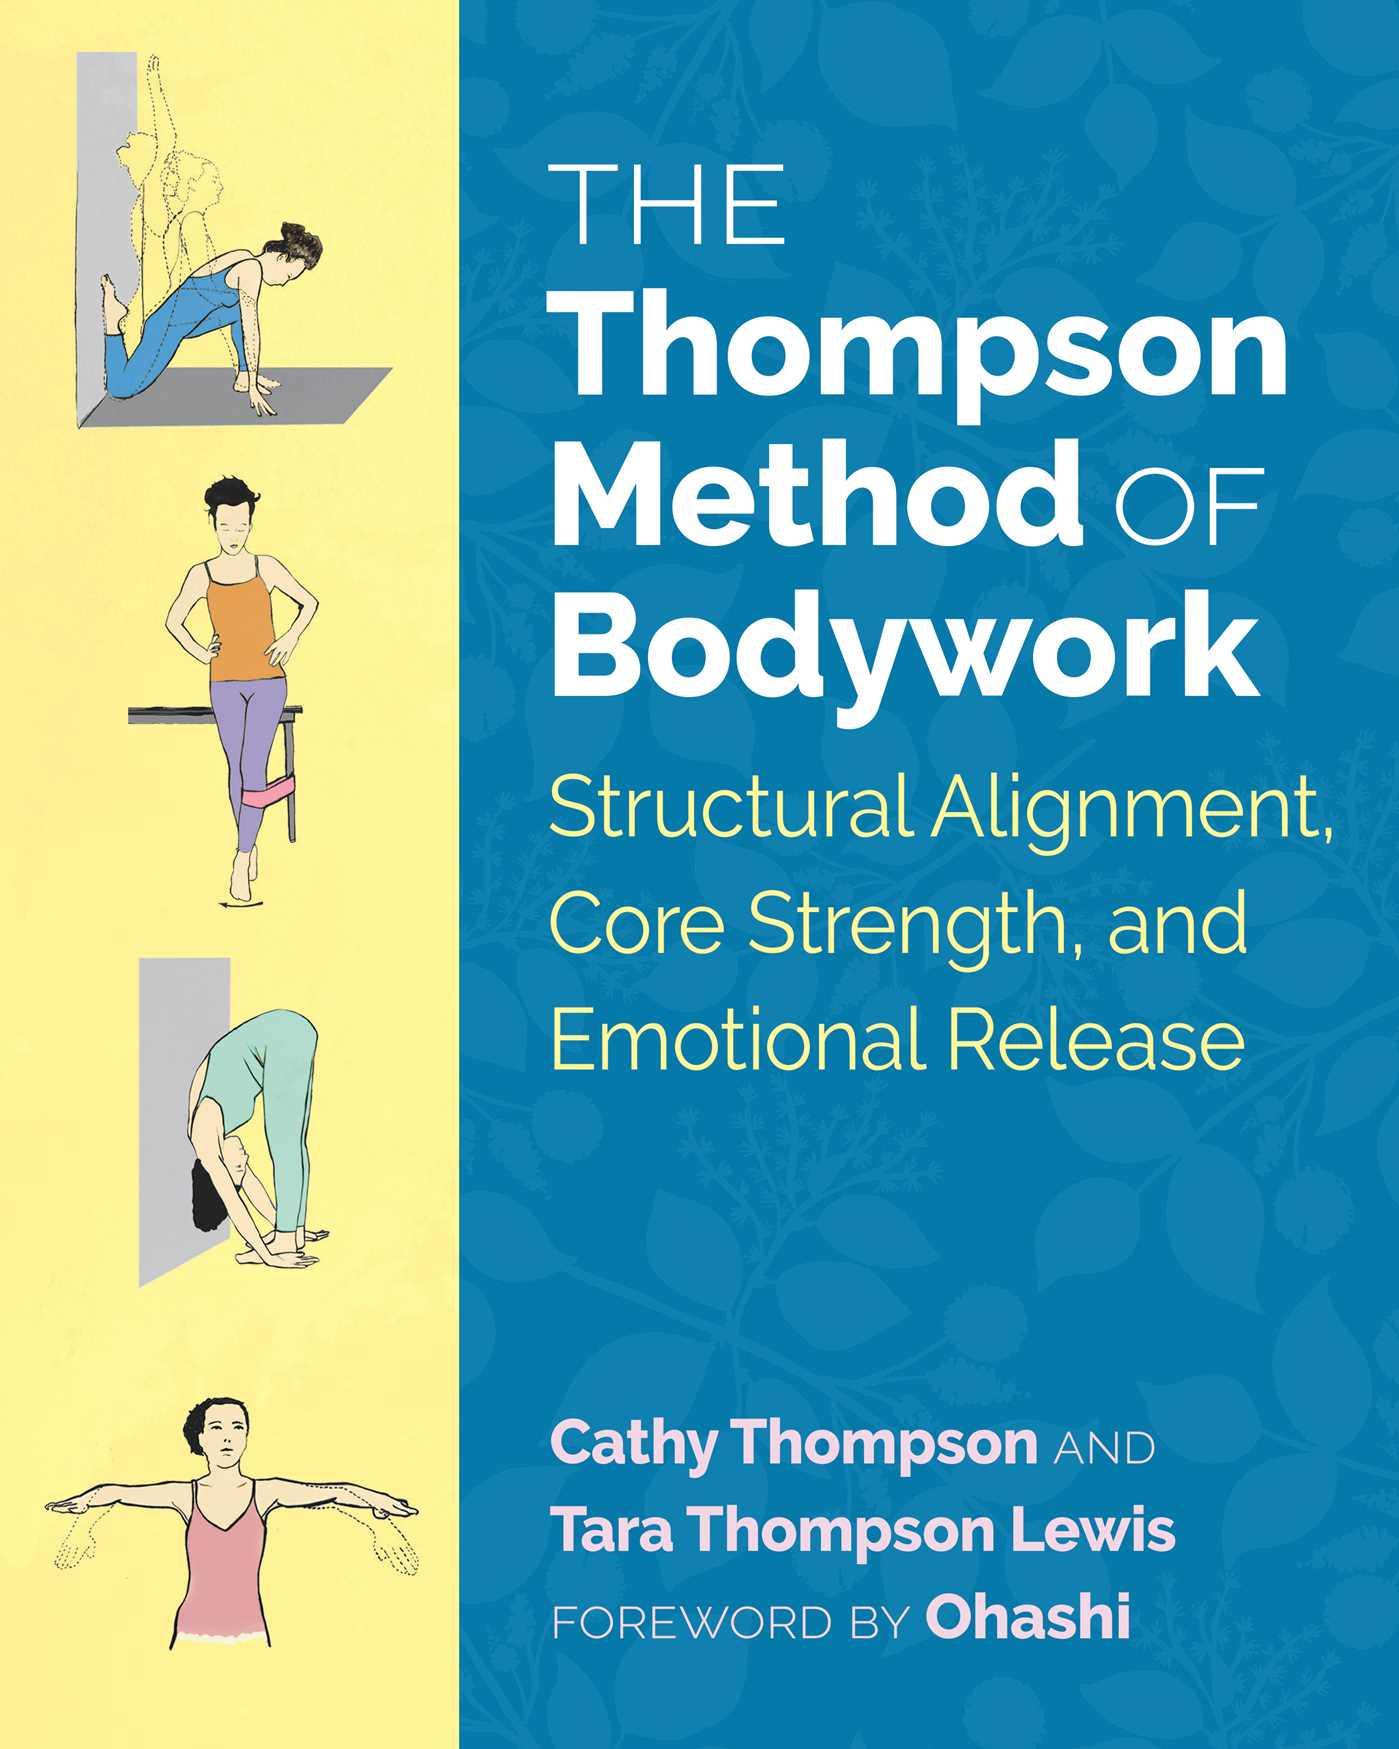 The thompson method of bodywork 9781620556641 hr